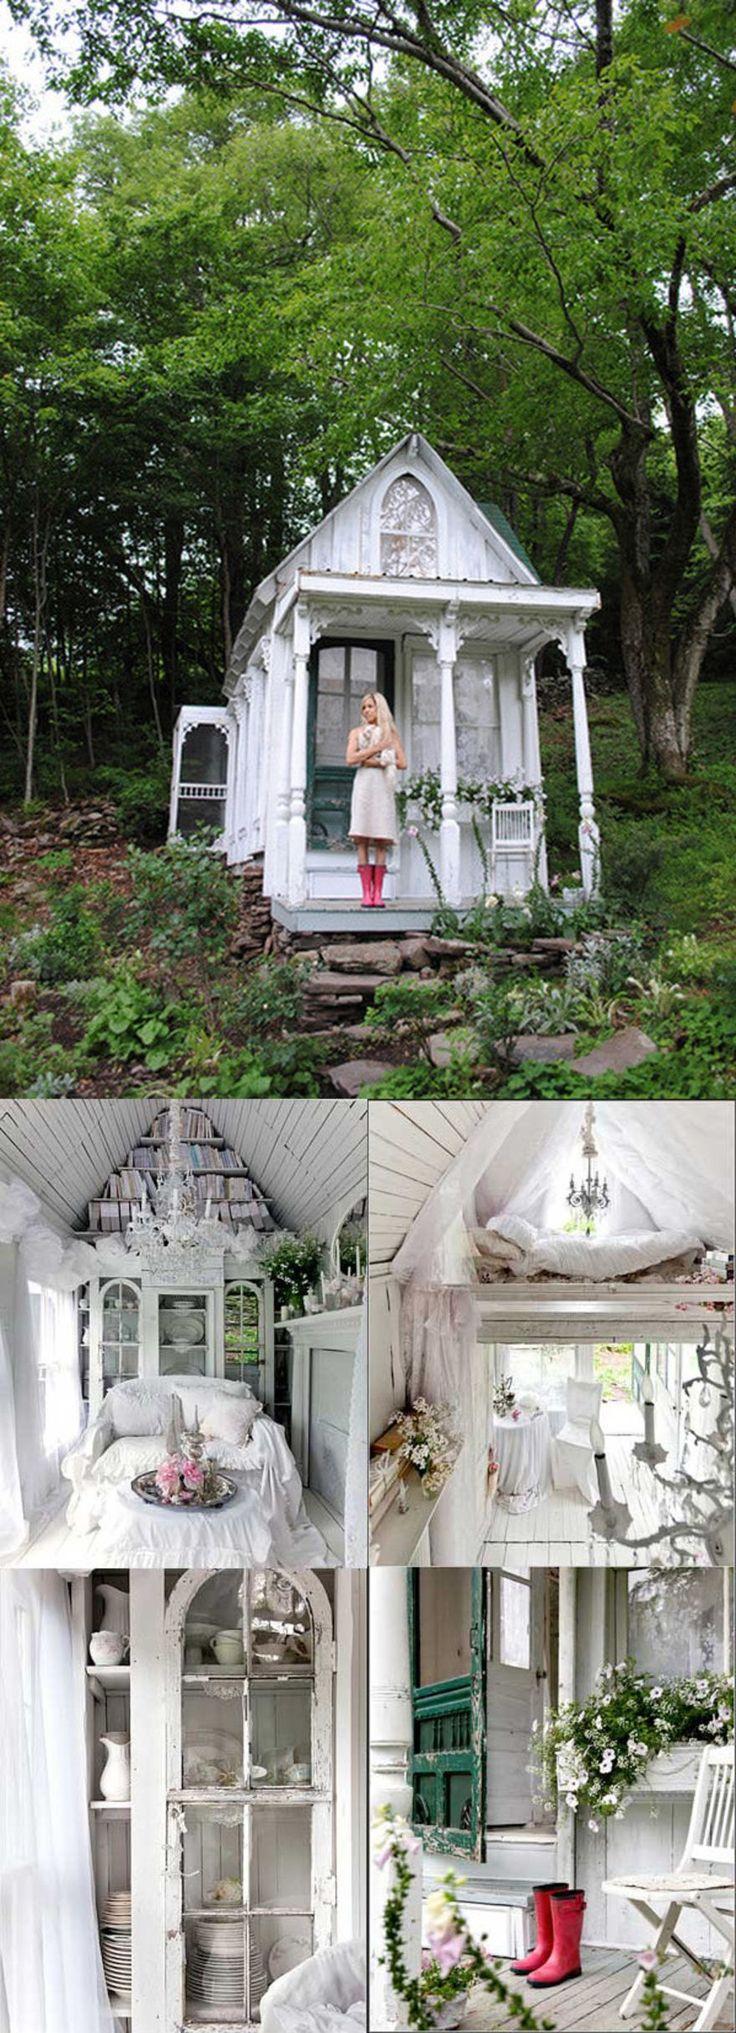 2. Victorian Paradise!